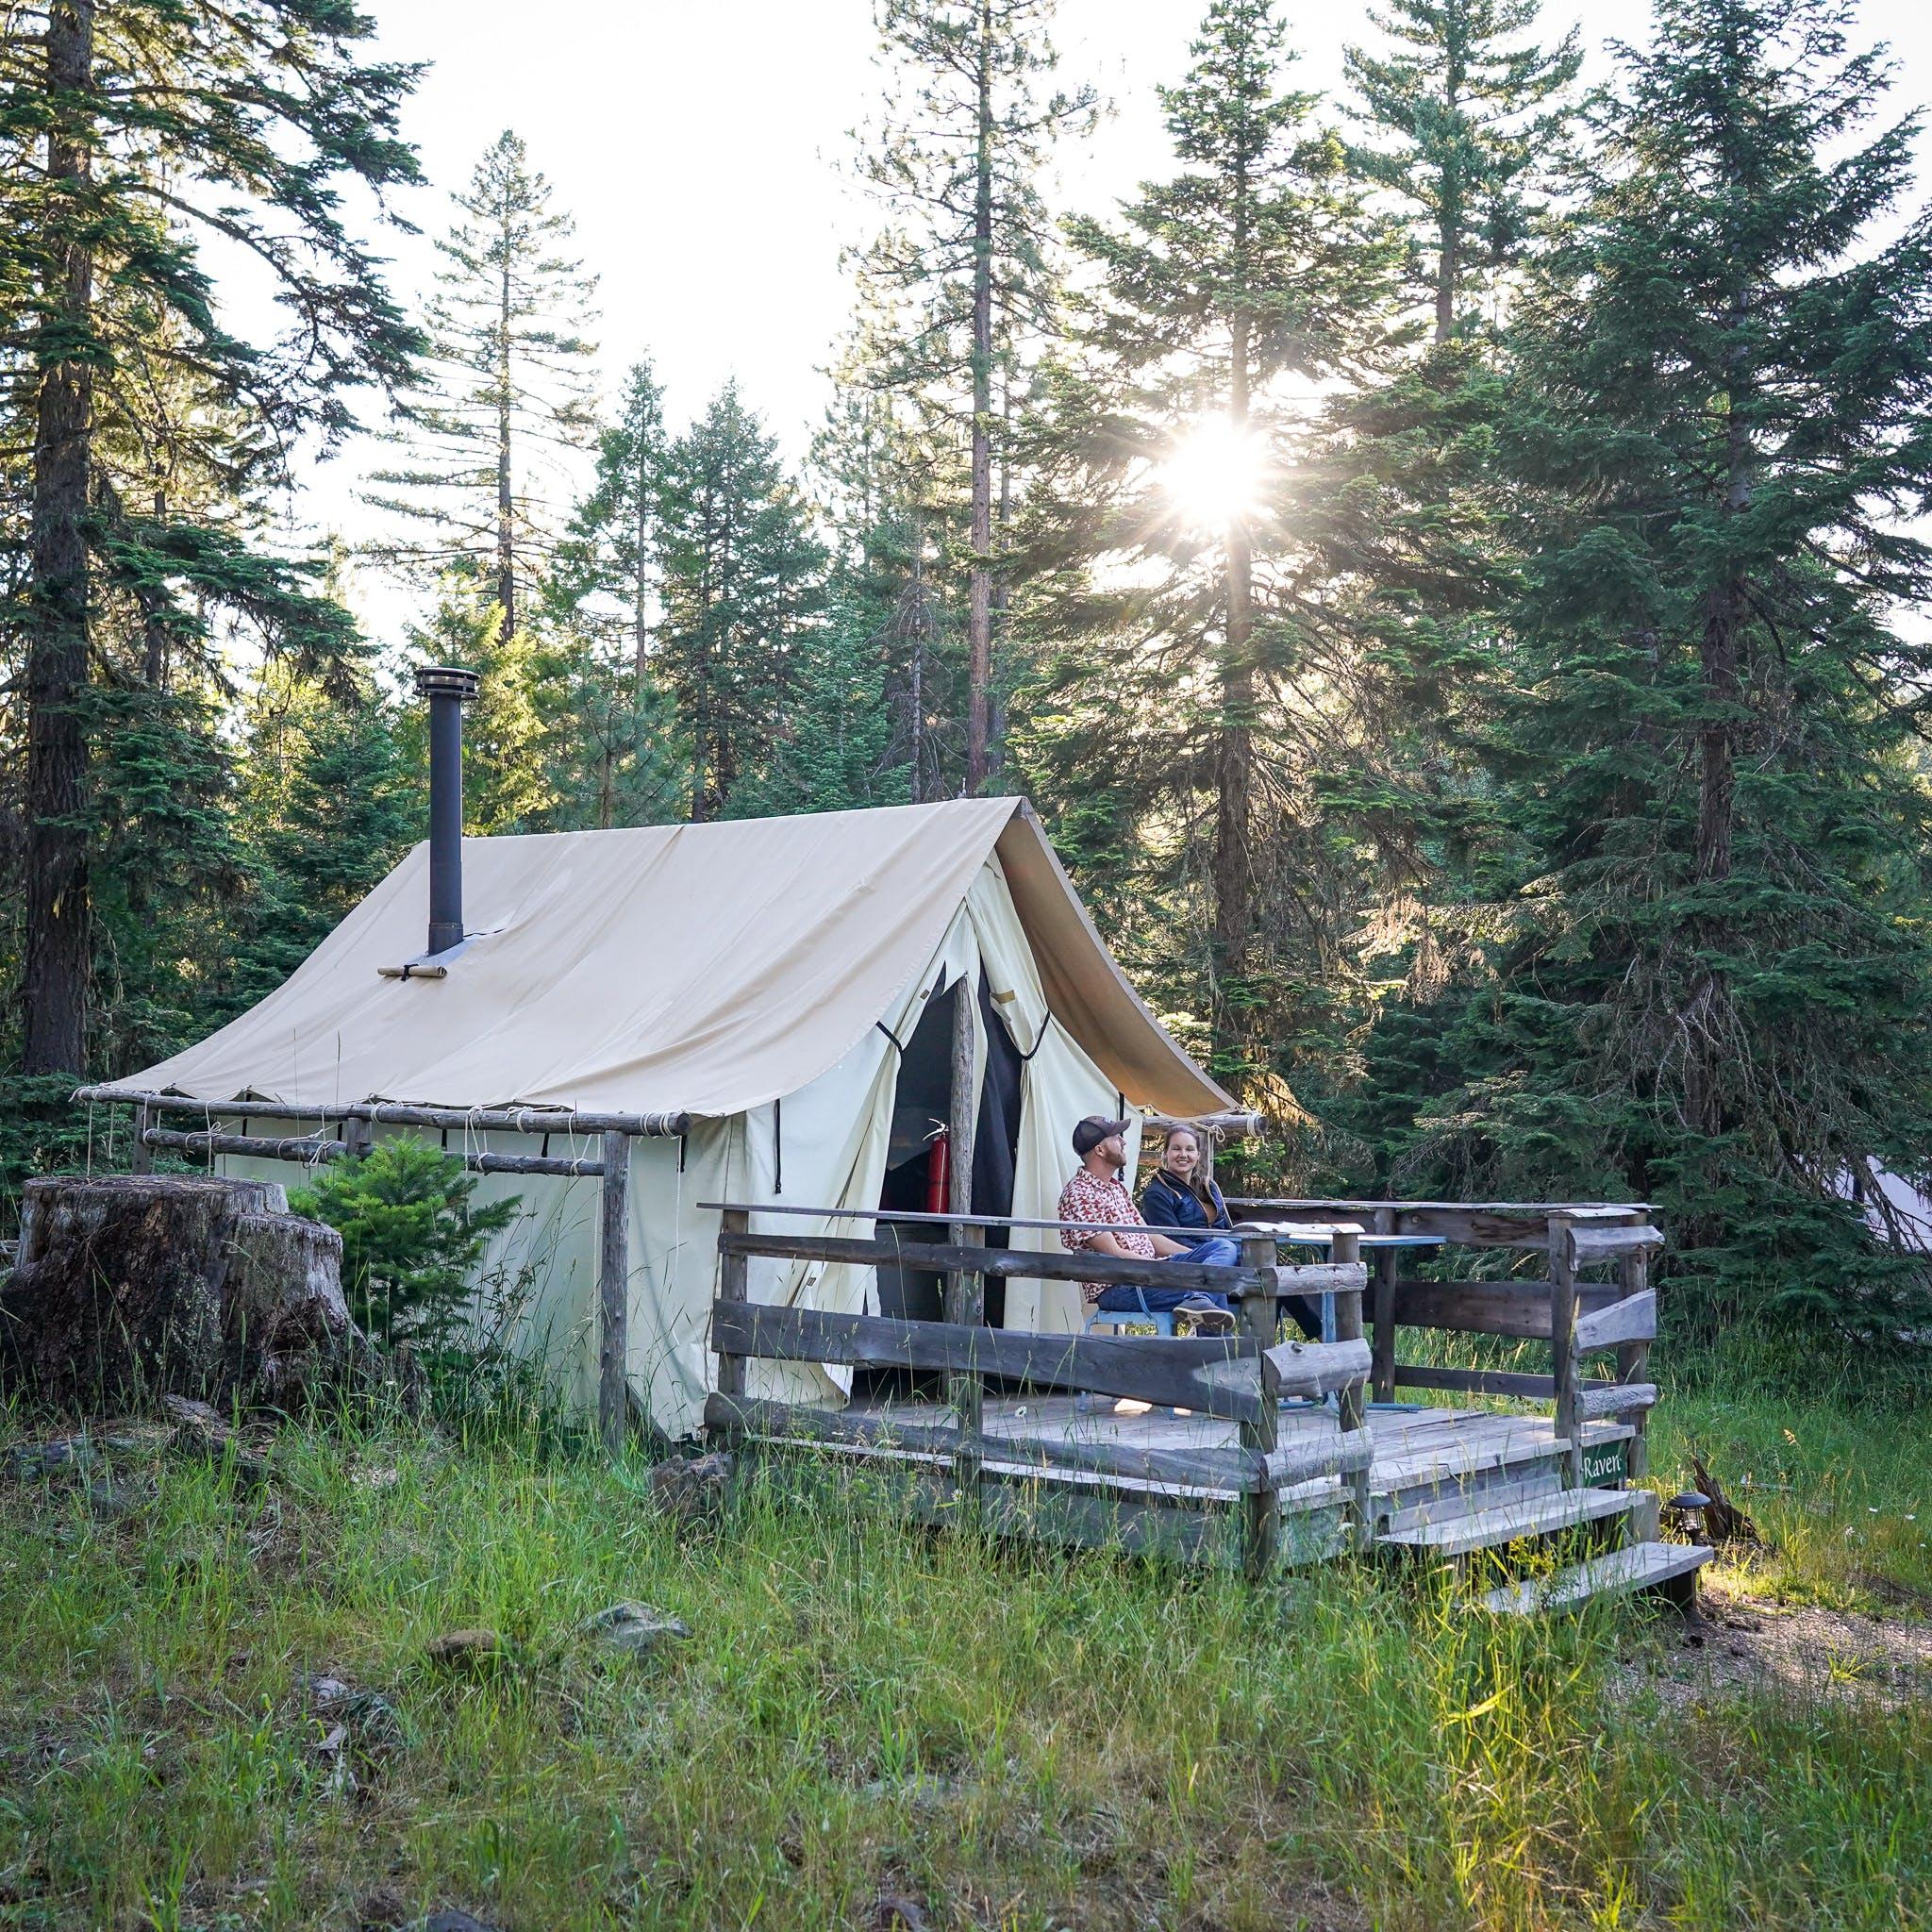 Willow Witt Ranch tent cabin glamping Ashland Oregon